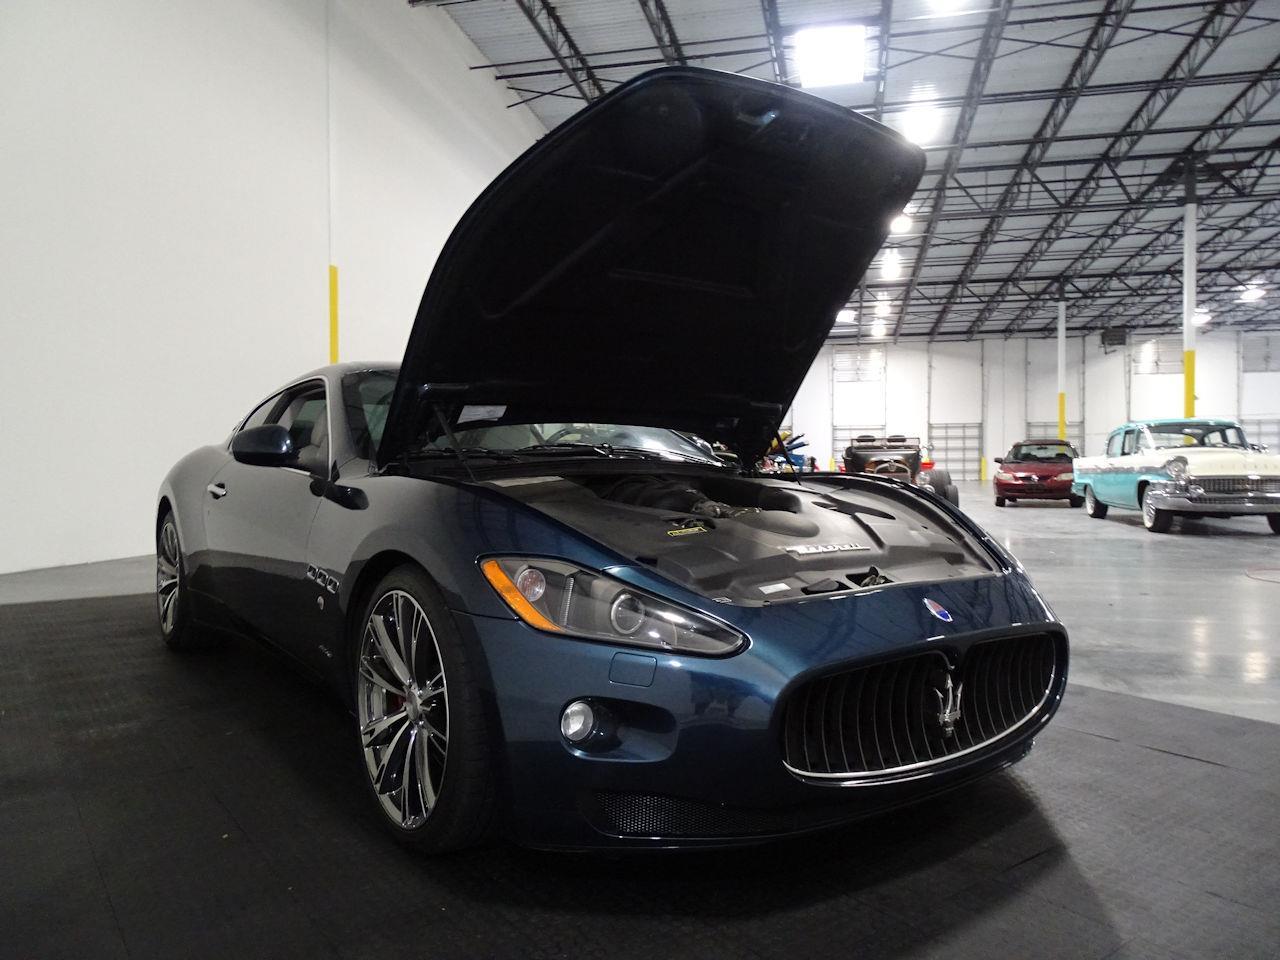 Large Picture of 2008 Maserati GranTurismo located in Houston Texas - $42,995.00 - MO4H